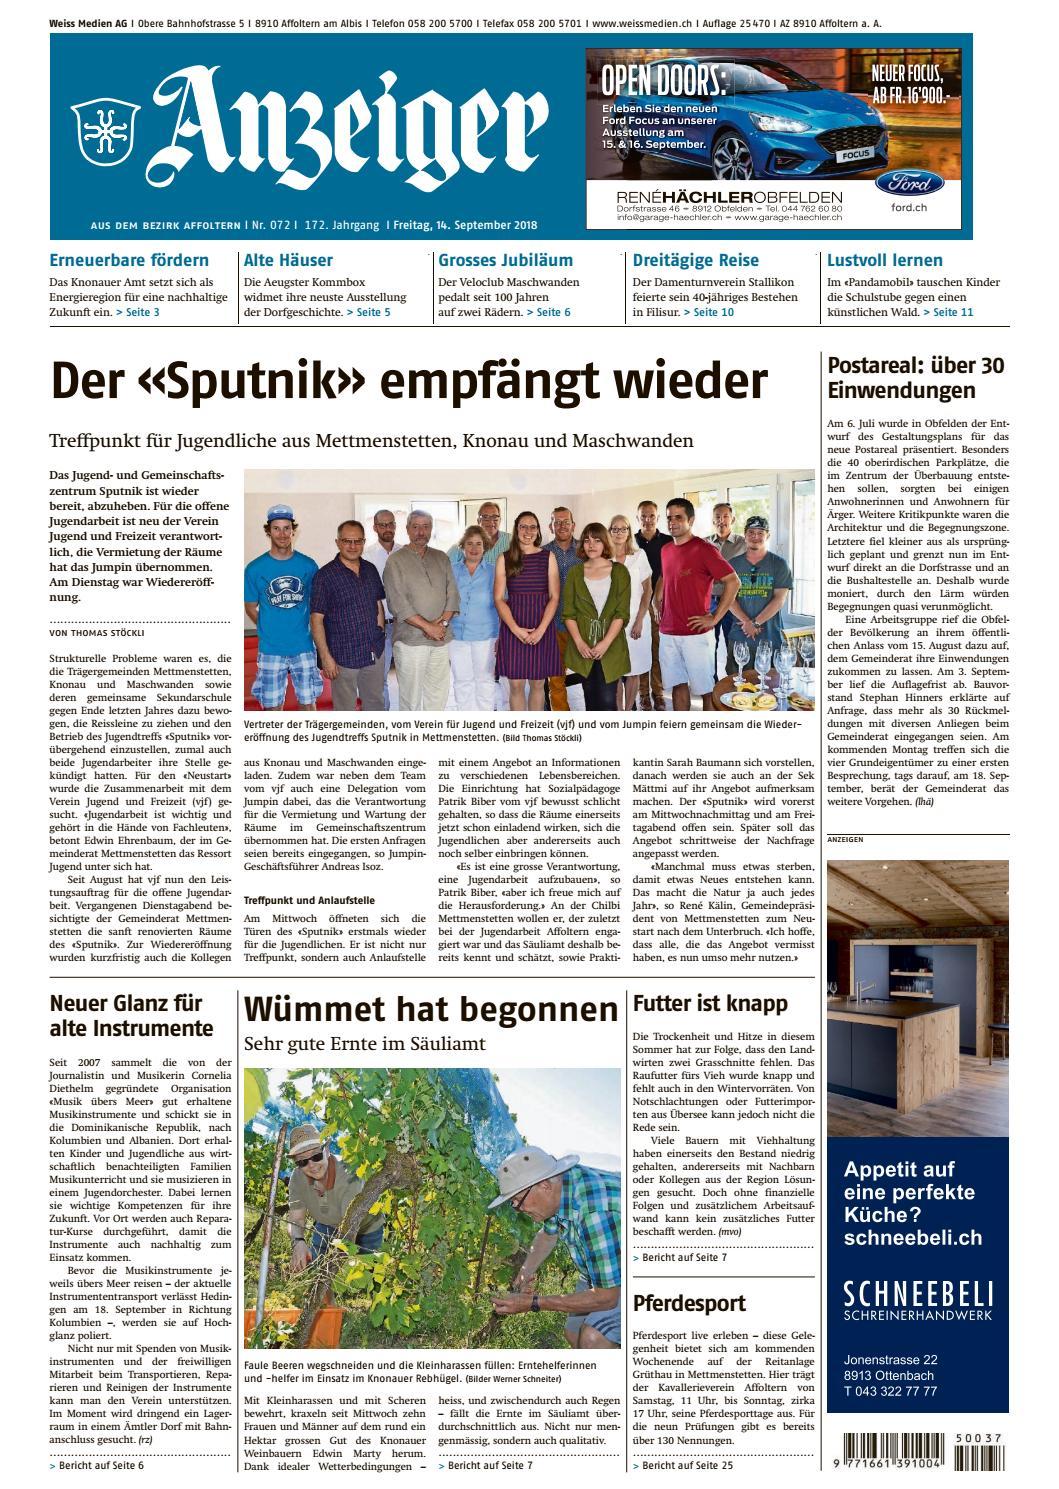 072_2018 by AZ-Anzeiger - issuu